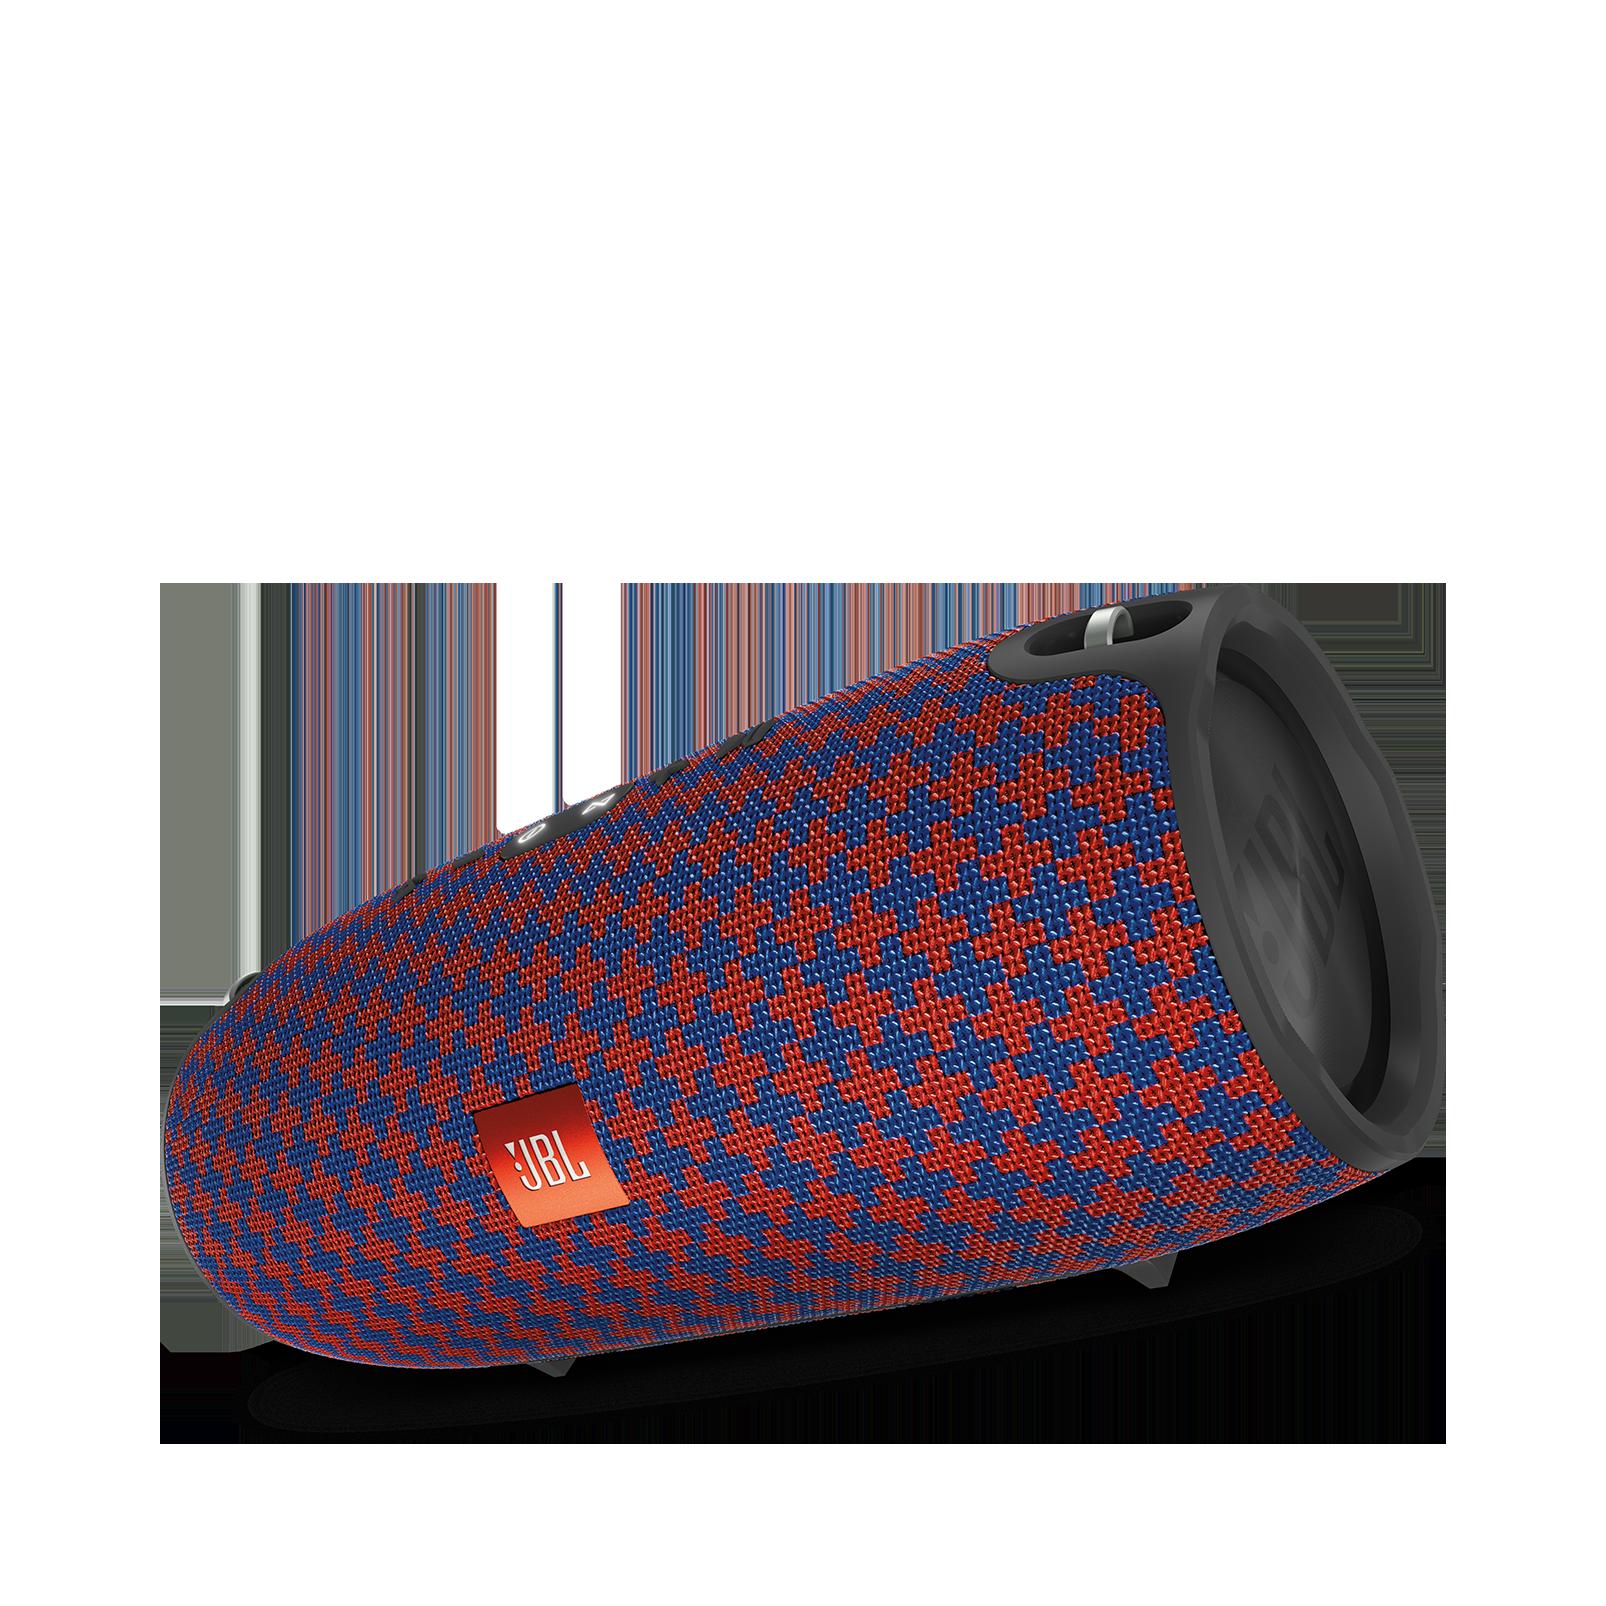 jbl xtreme special edition portable bluetooth speaker. Black Bedroom Furniture Sets. Home Design Ideas